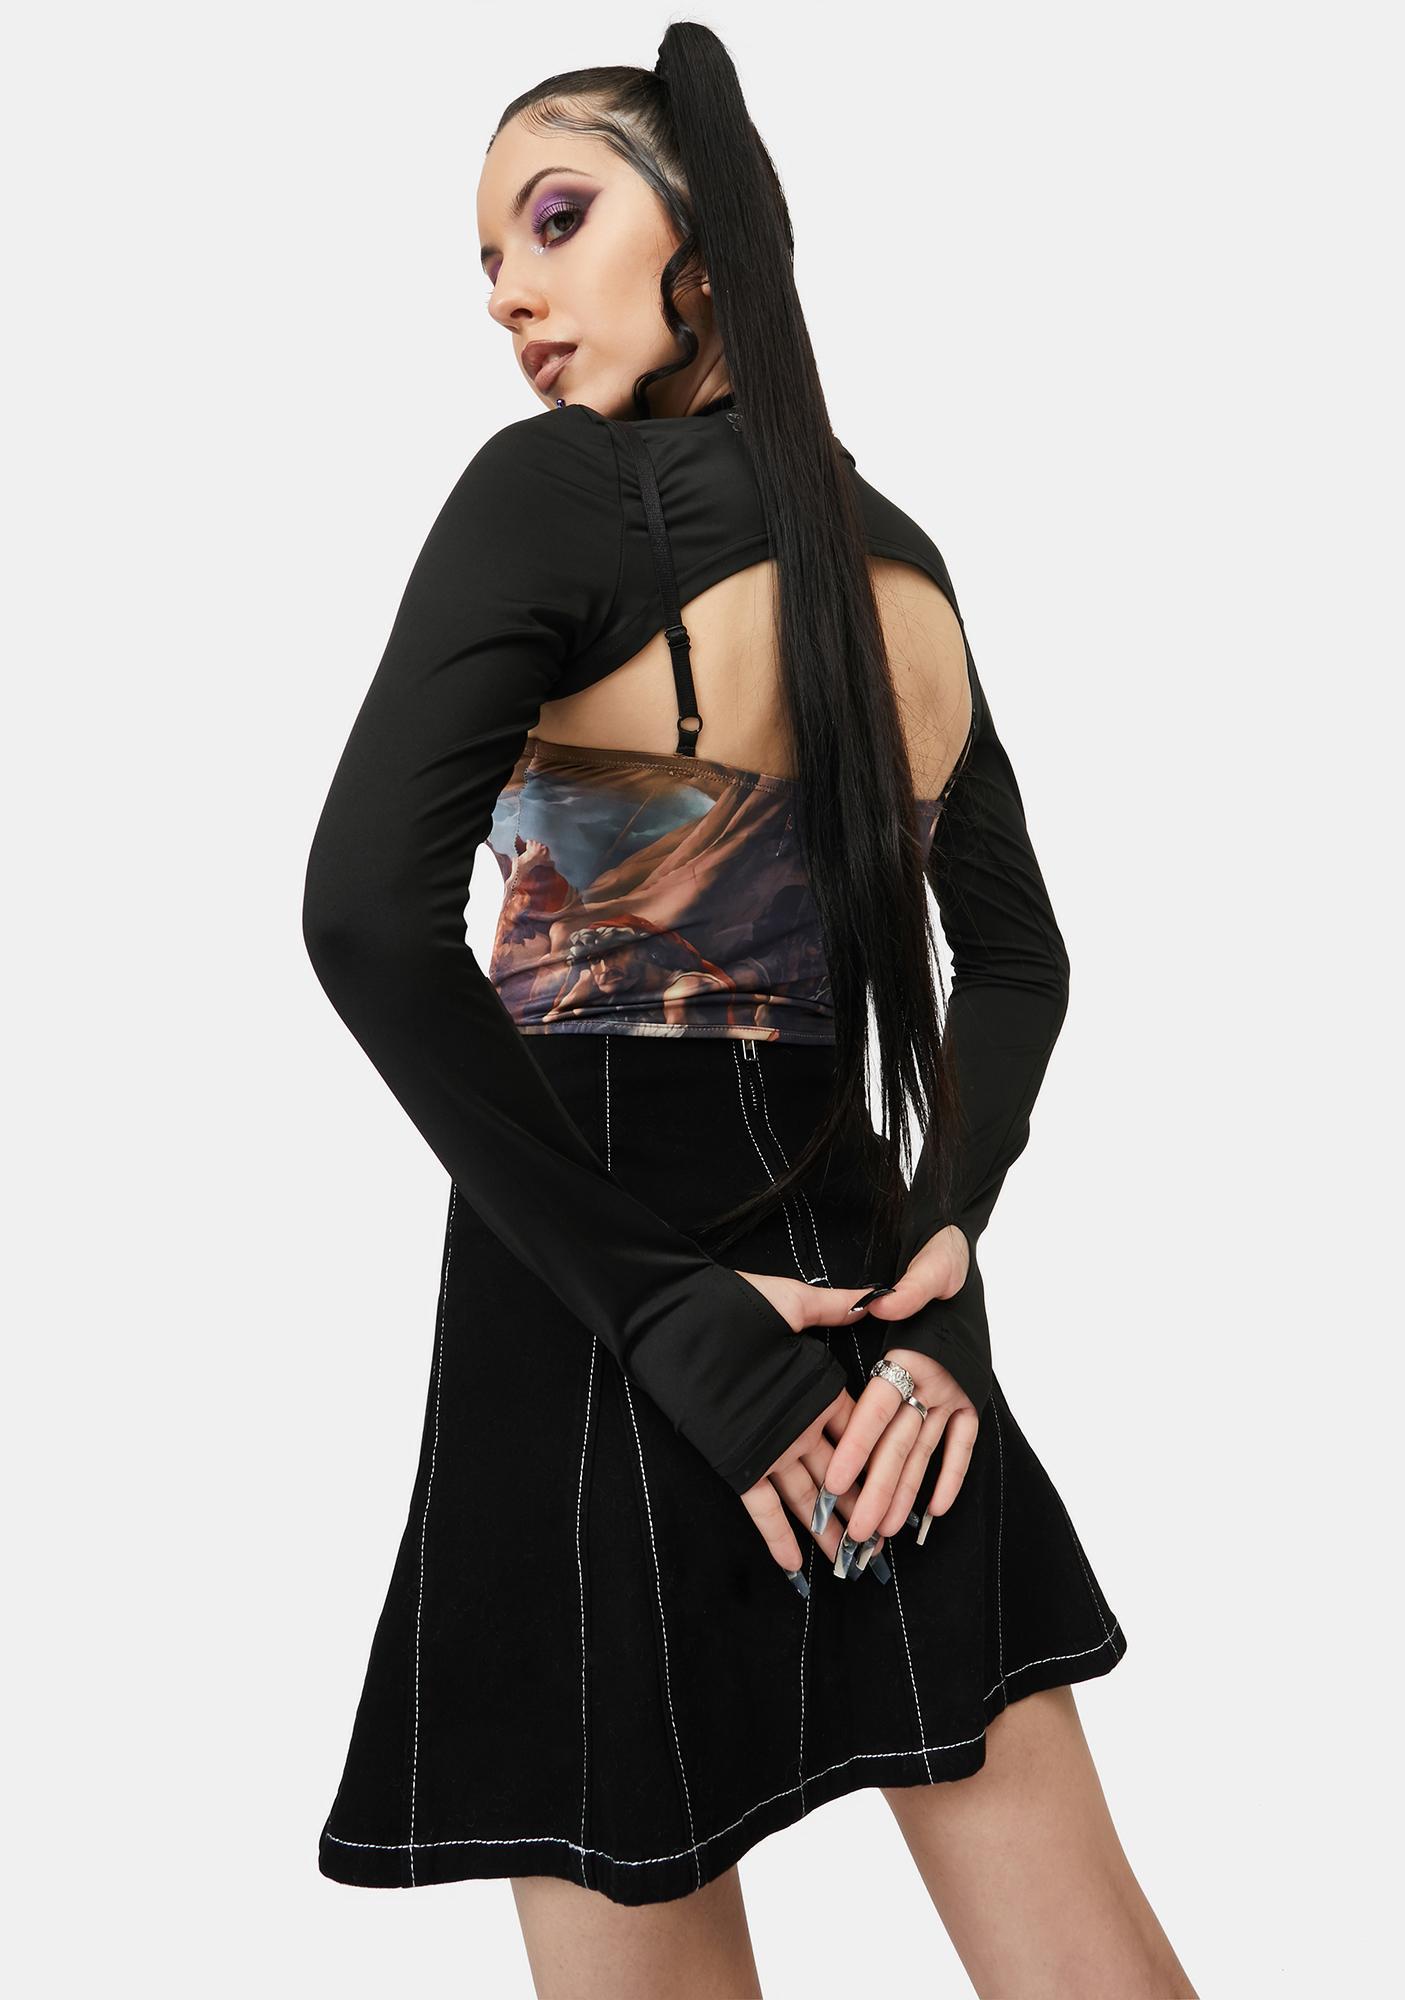 ZEMETA Mystic Corset Long Sleeve Top